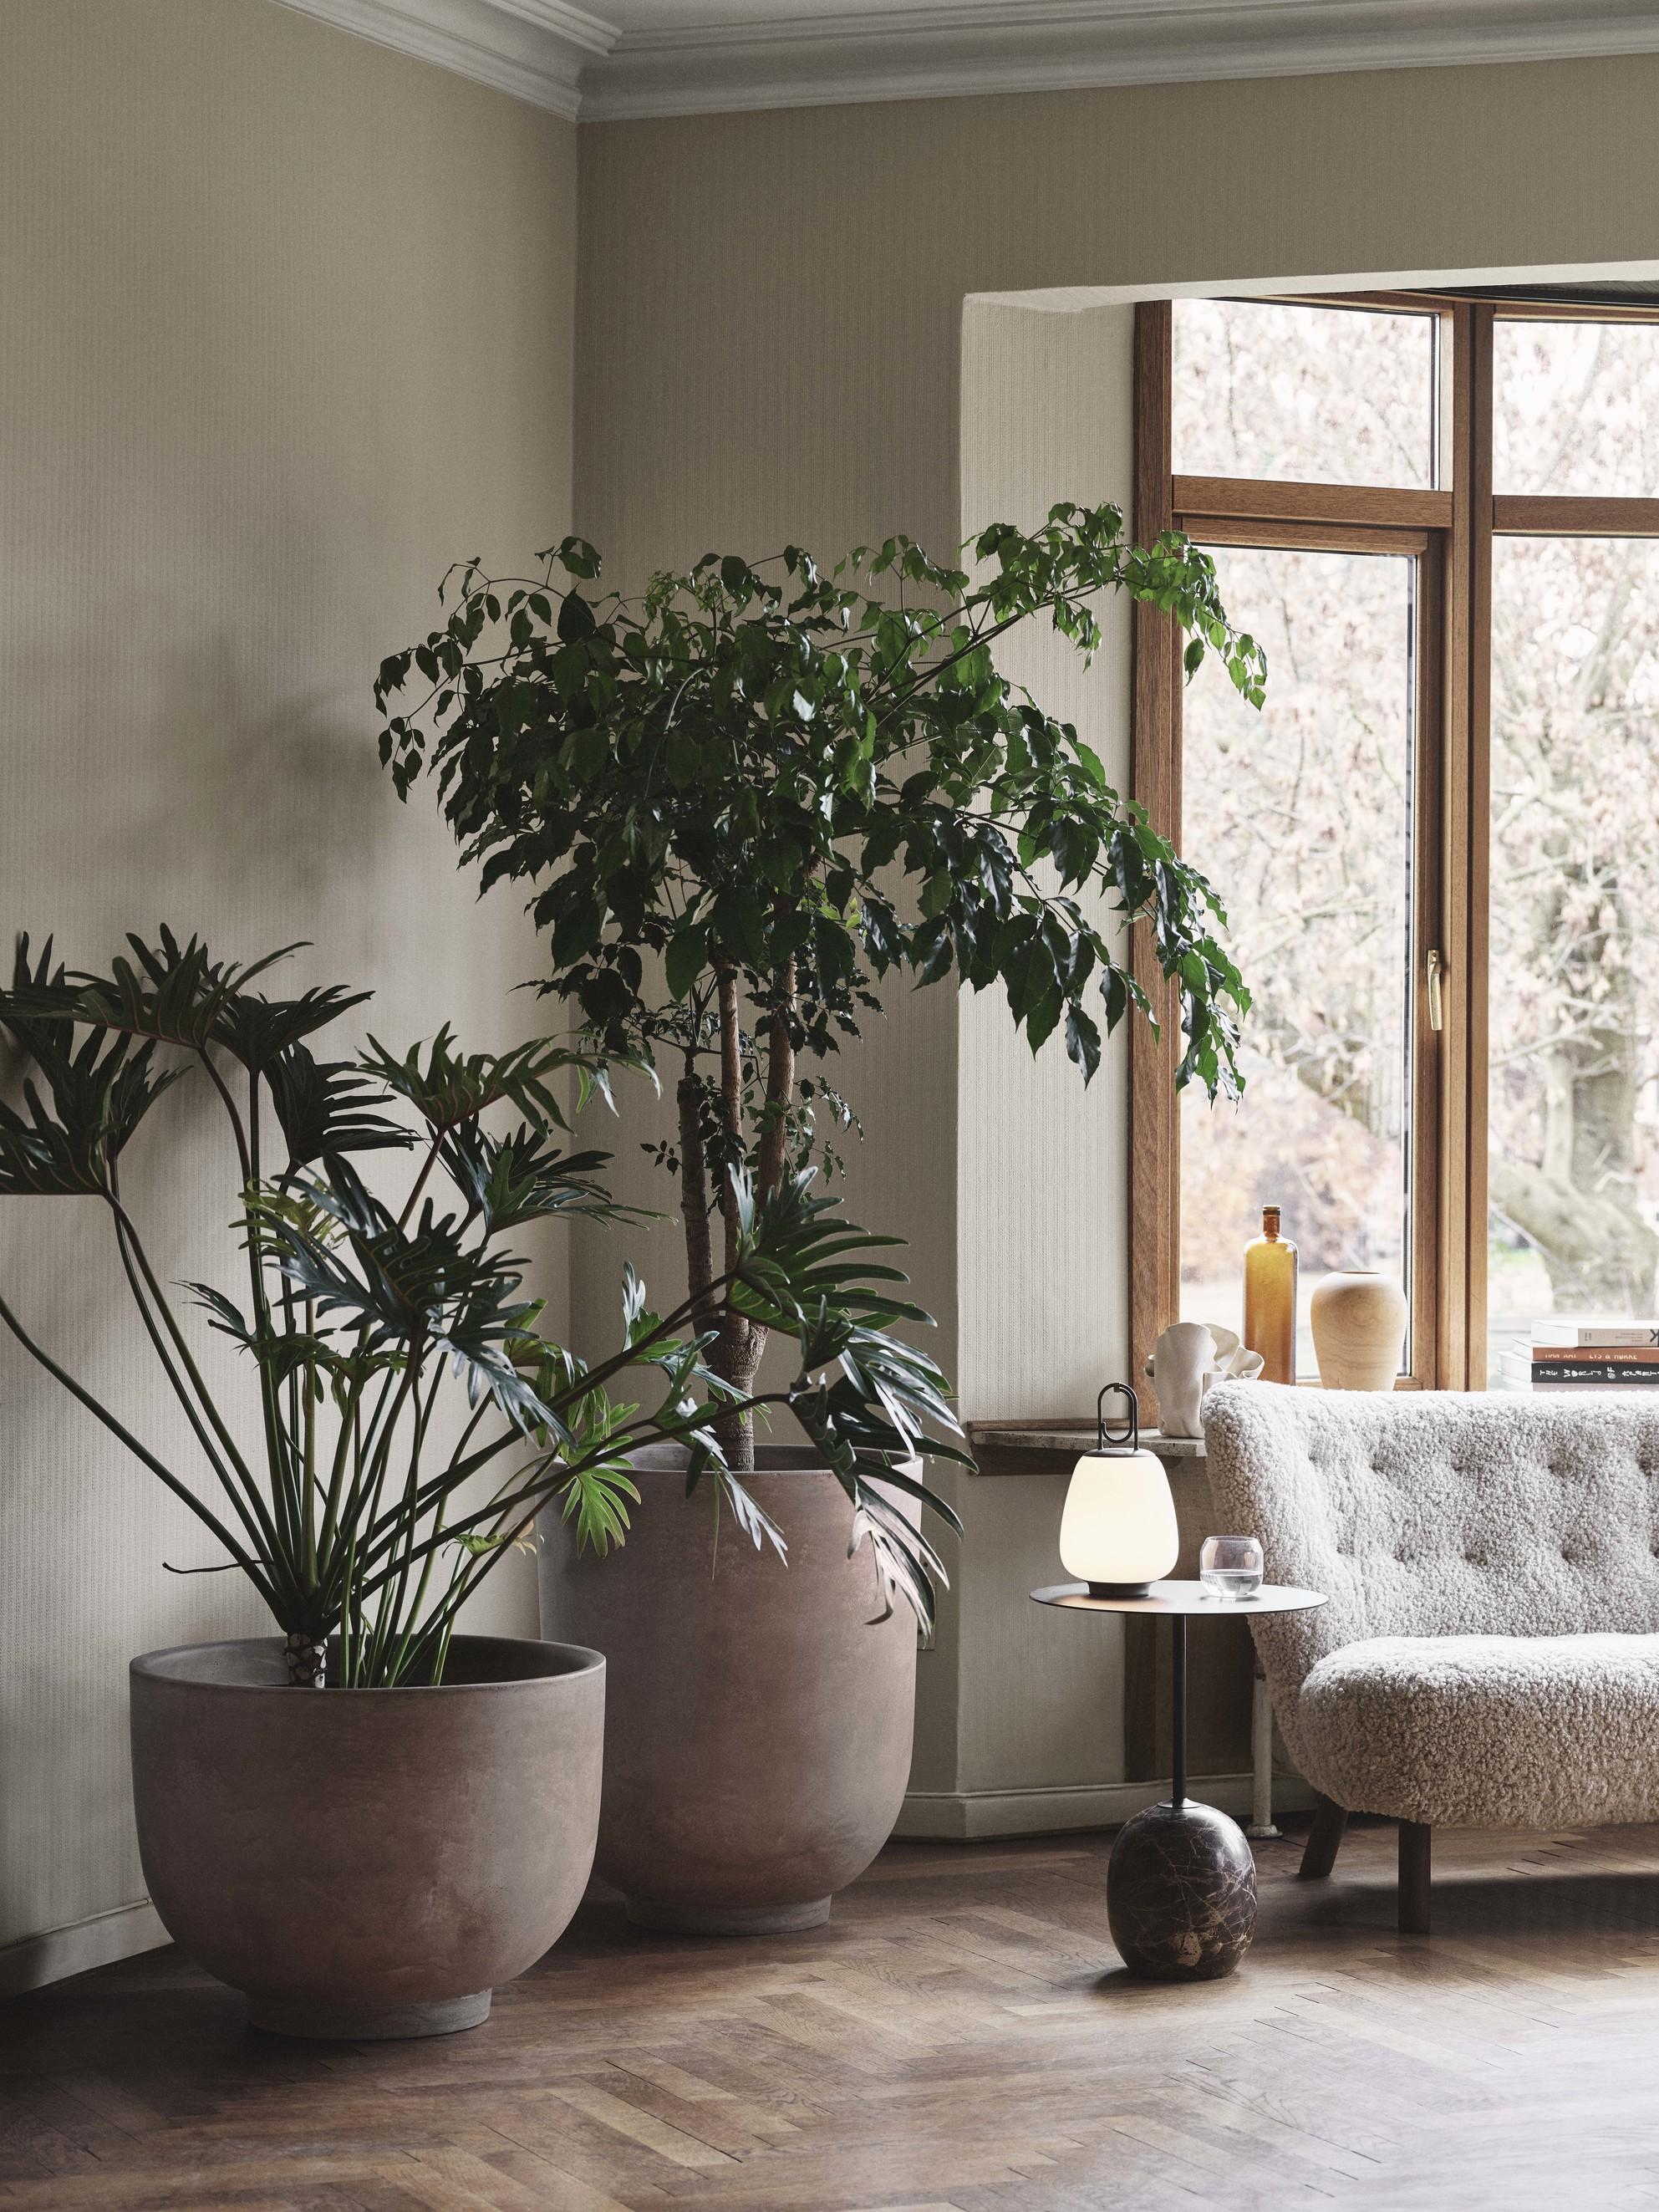 &Tradition Collect Planter SC44 Silver Grey H: 65 cm